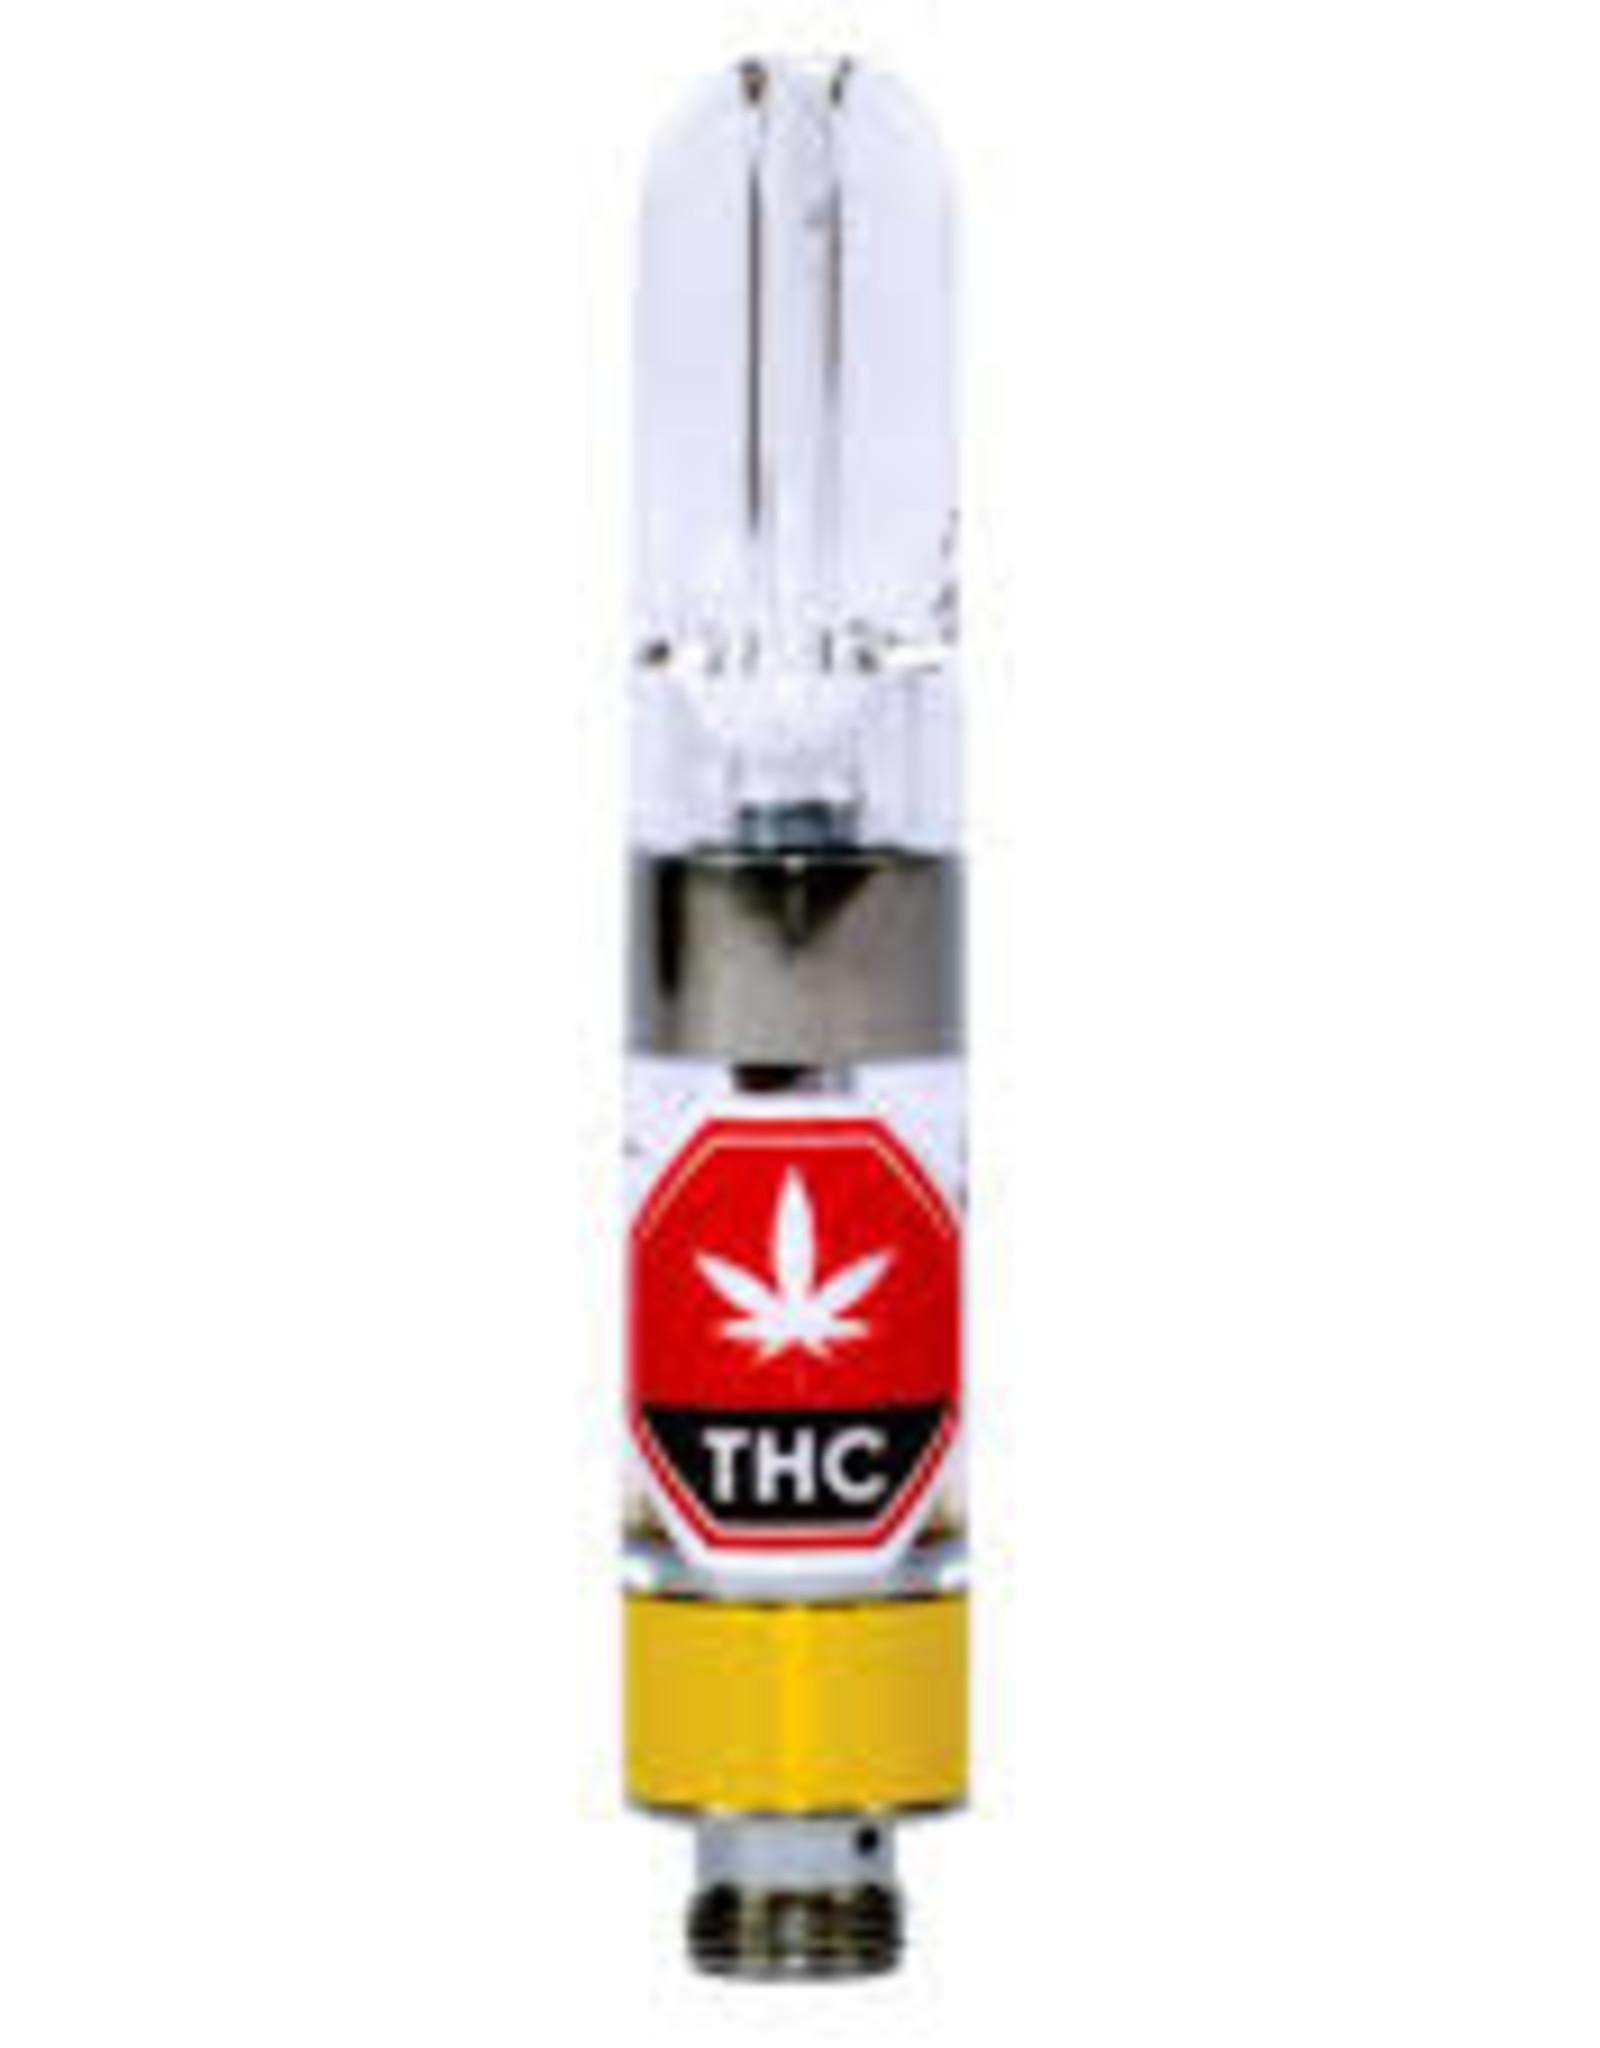 Hexo **Hexo - Durban Cartridge - 0.5g